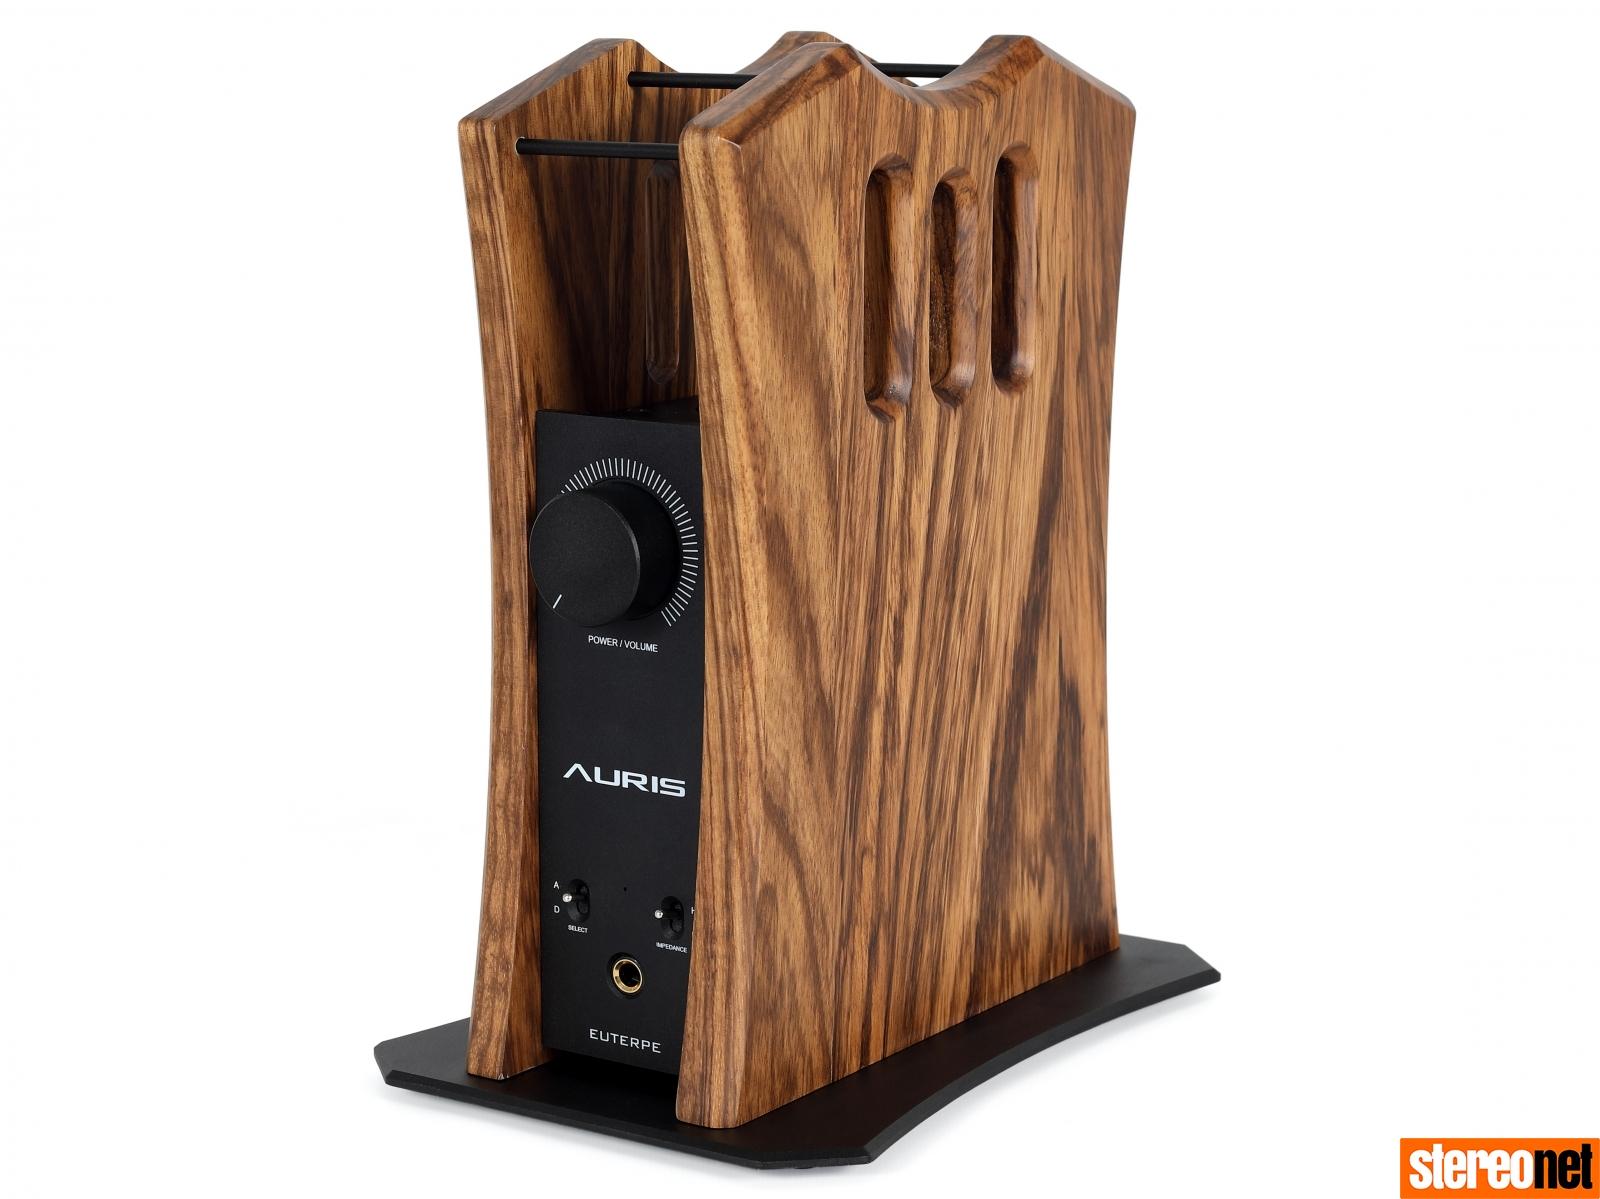 Auris Euterpe Heaphone Amp